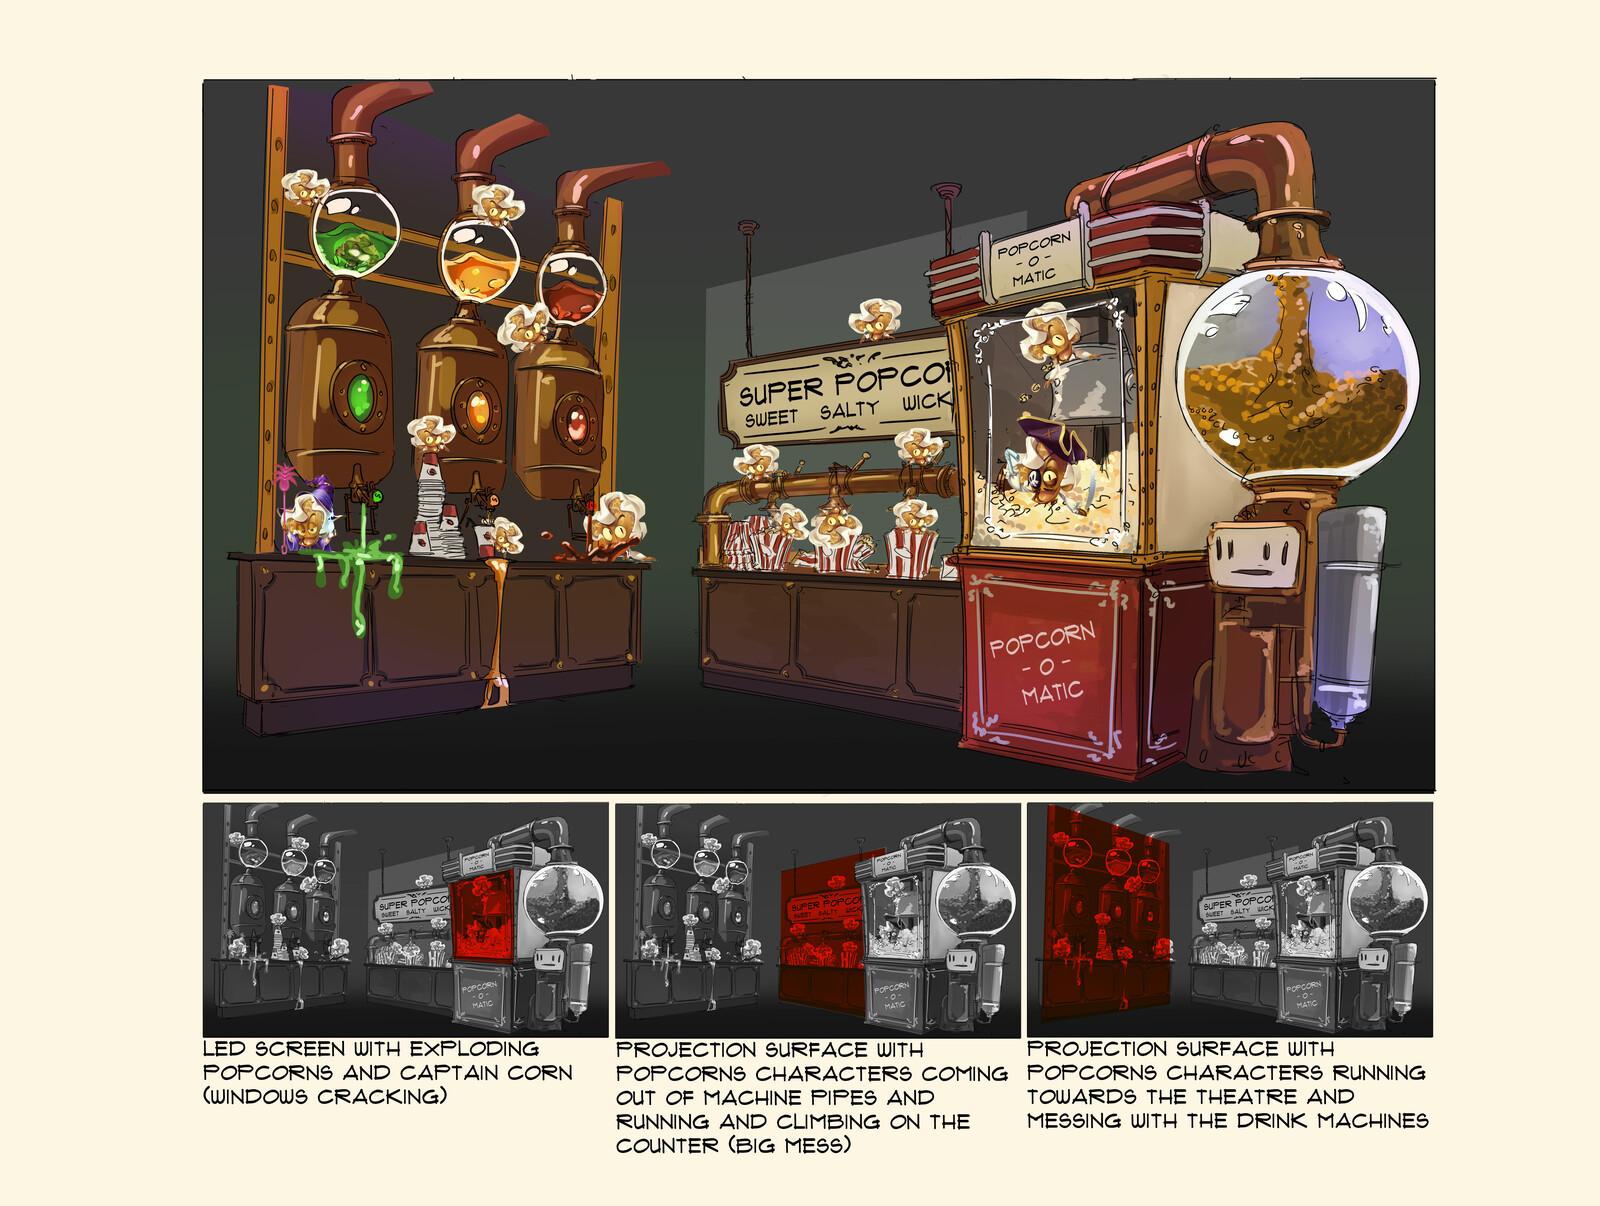 Popcorn machine concept